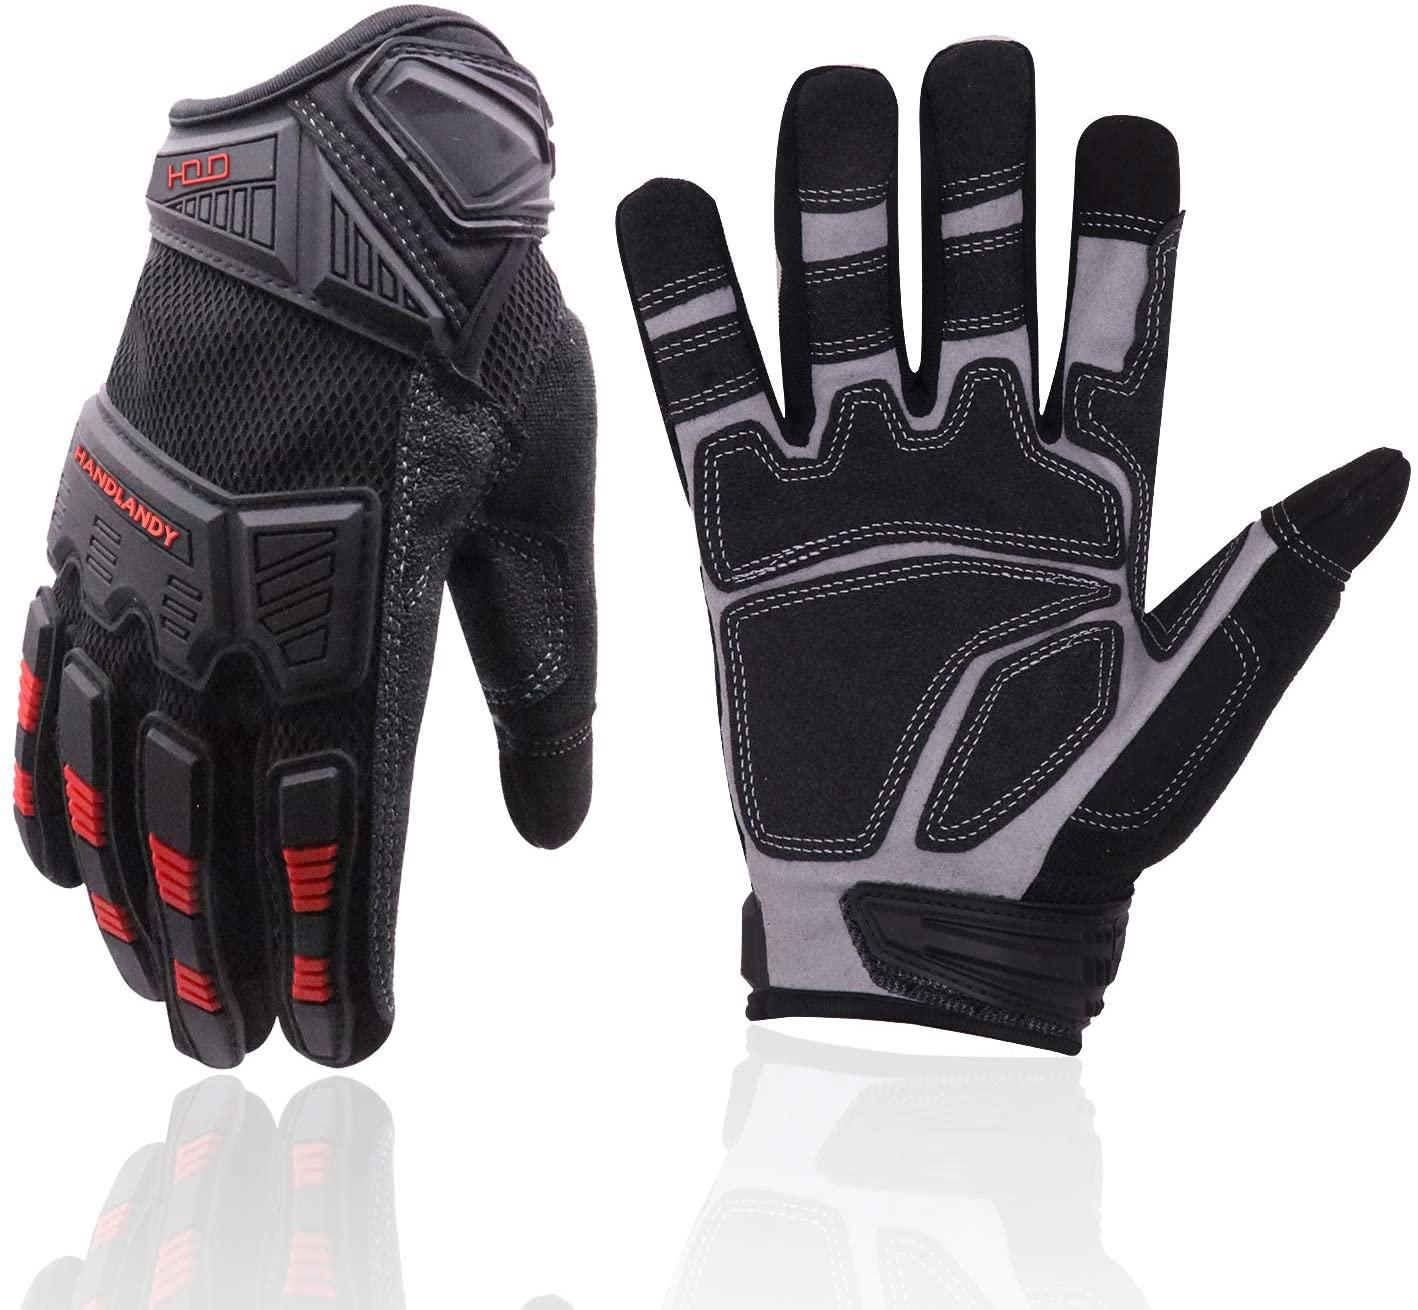 HANDLANDY Heavy Duty Work Gloves Men, Touchscreen TPR Impact Reducing Work Gloves, Non-Slip Breathable Mechanics Gloves (Medium)